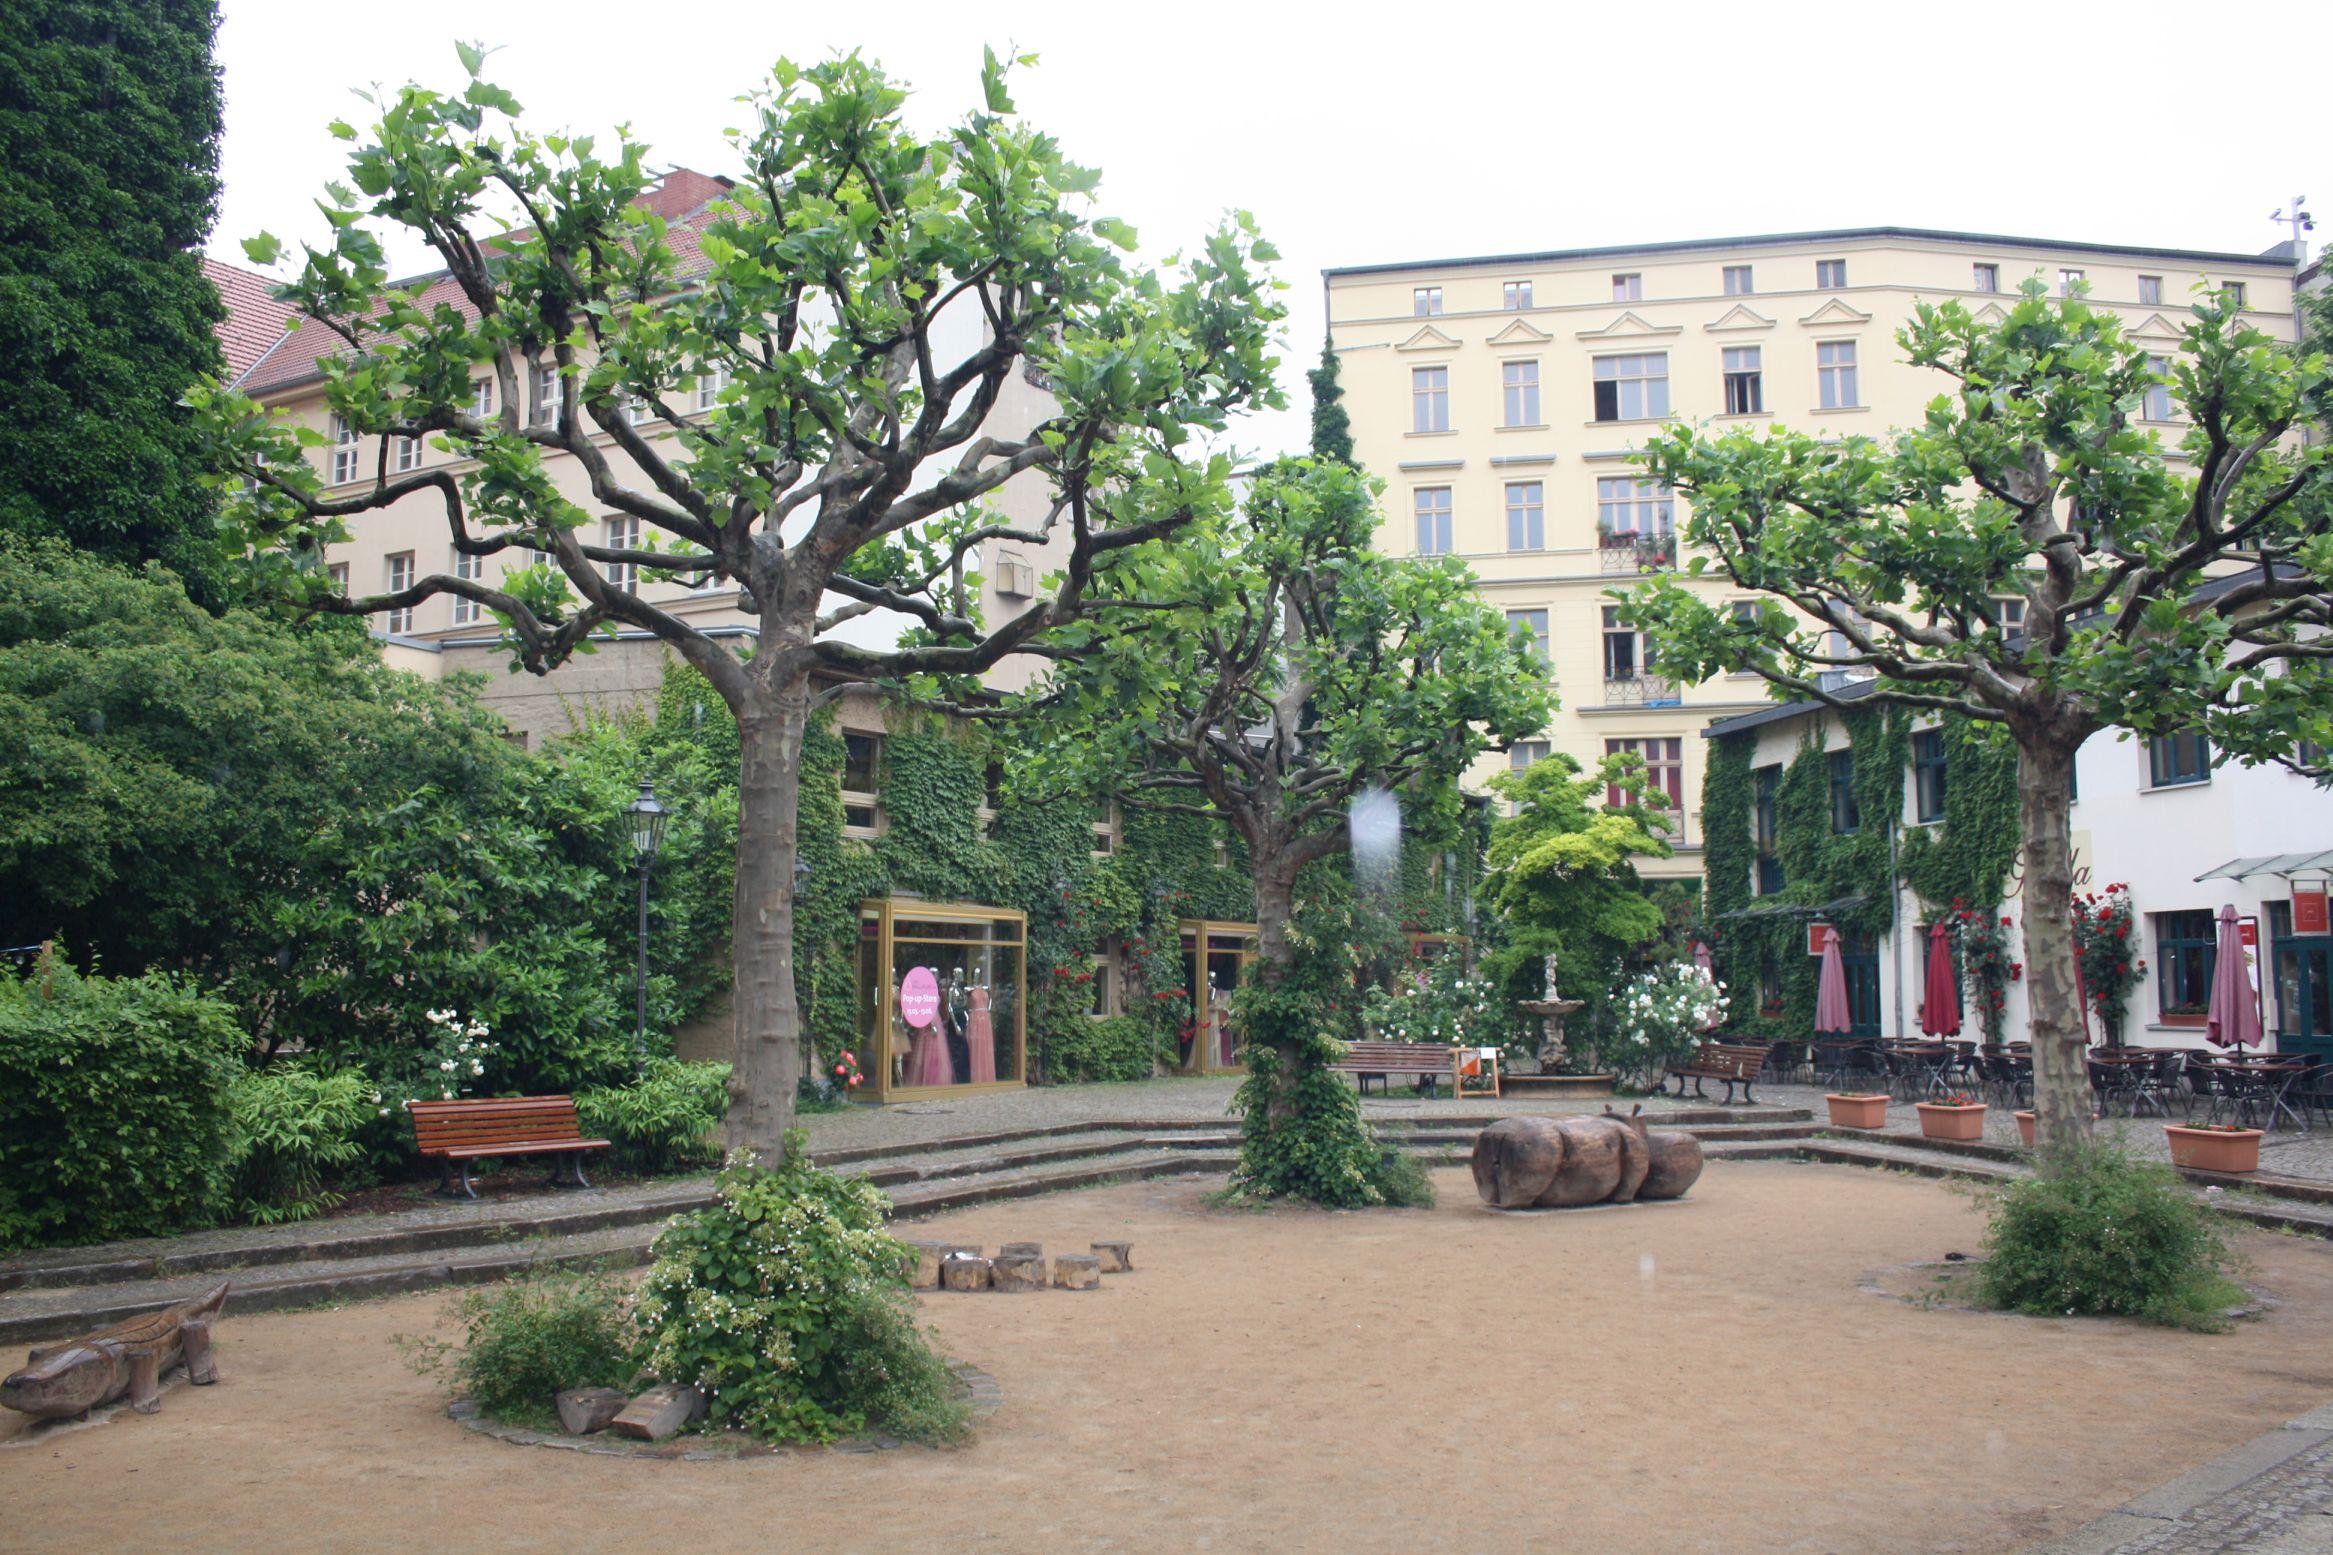 gelungene-premiere-vom-berliner-city-race-sightseeing-mit-ol-karte-2.jpg